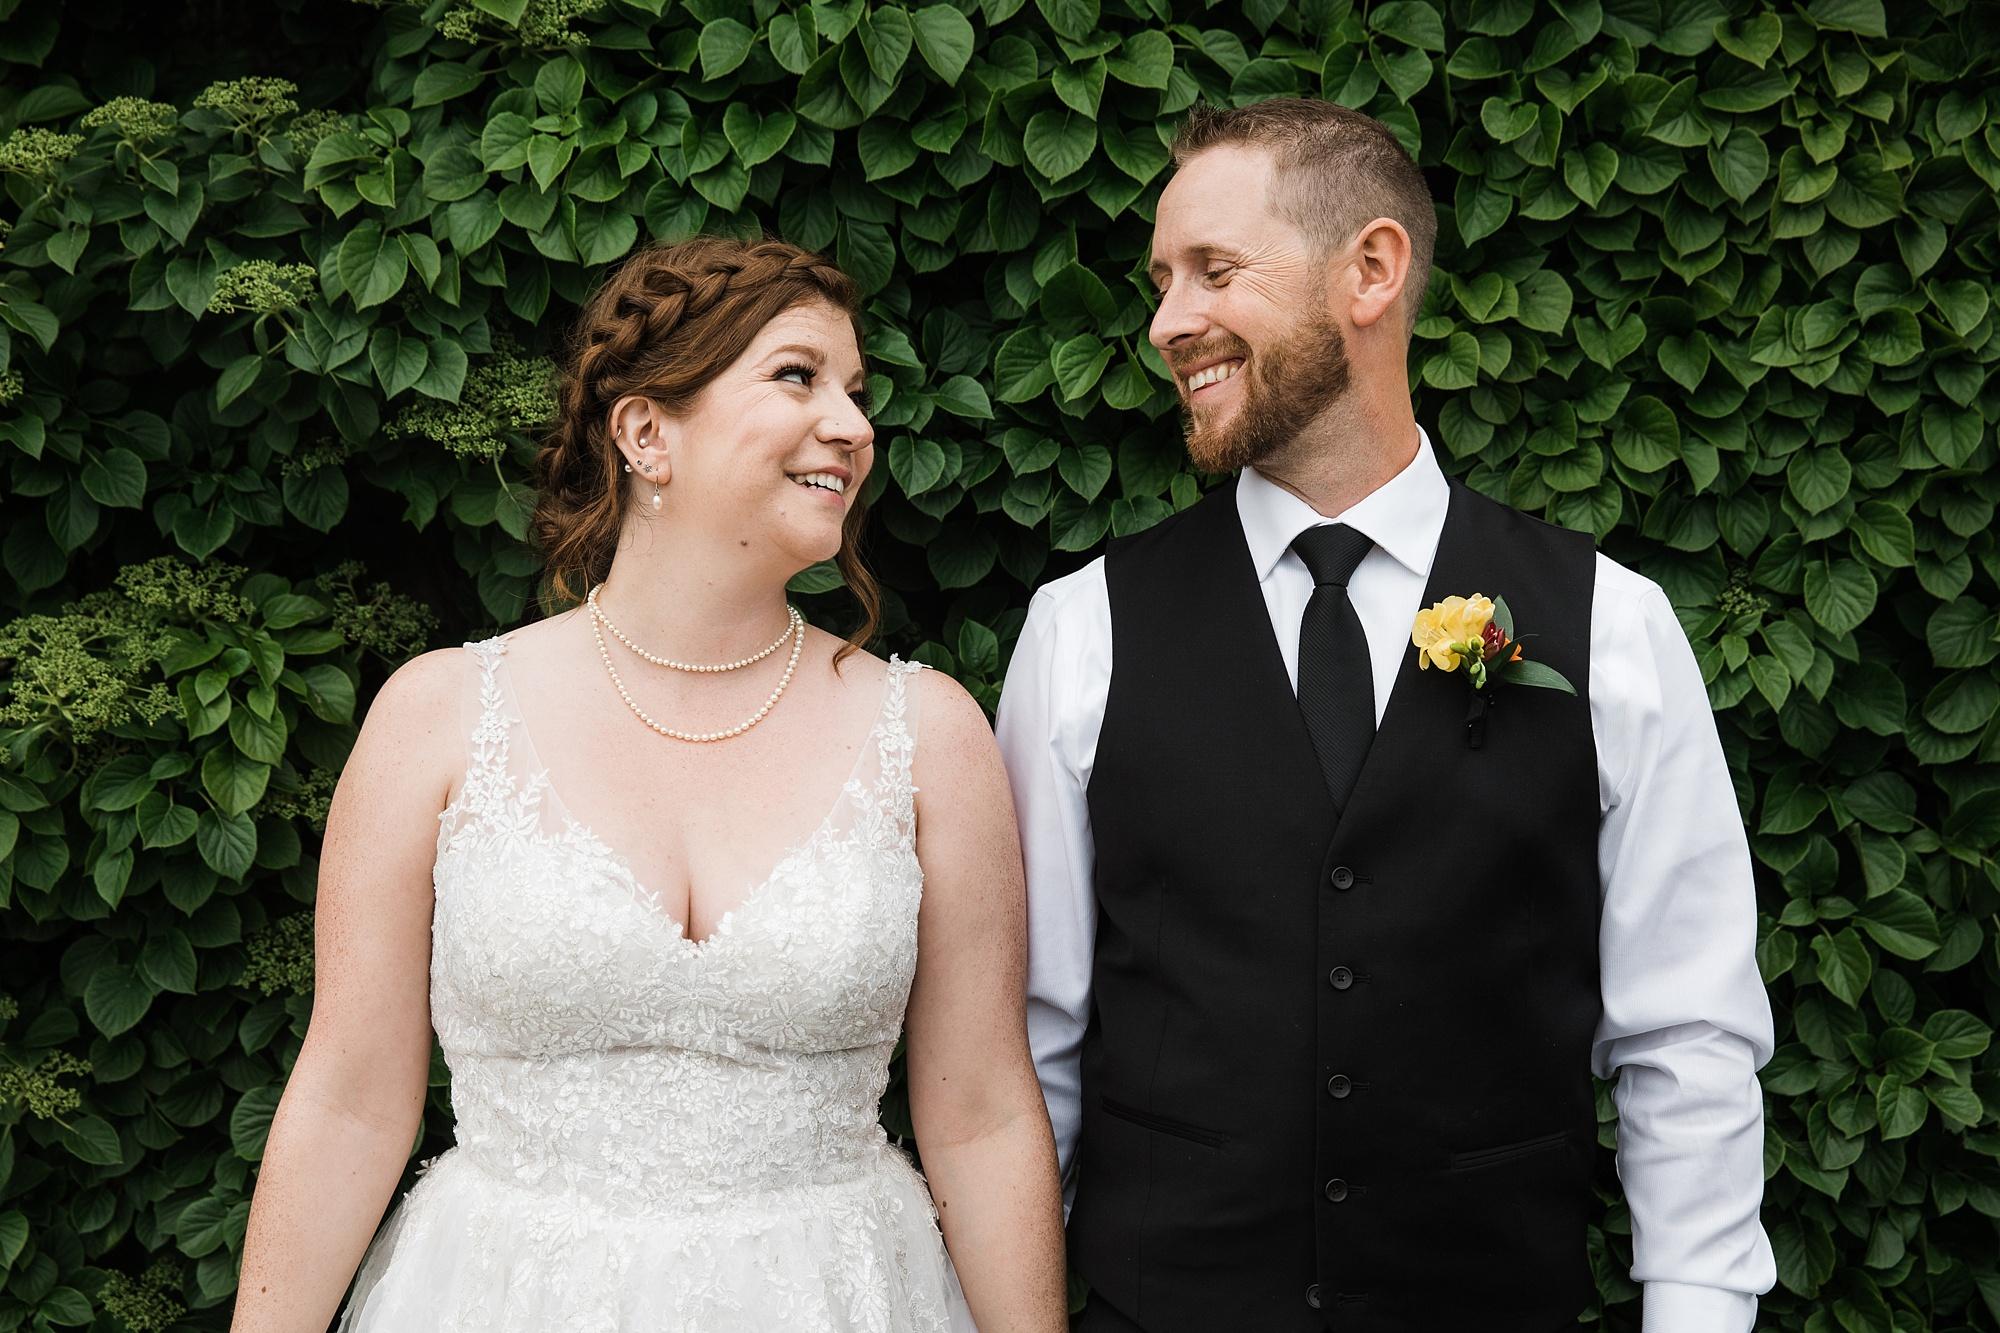 niagarafalls-weddingphotography_0055.jpg